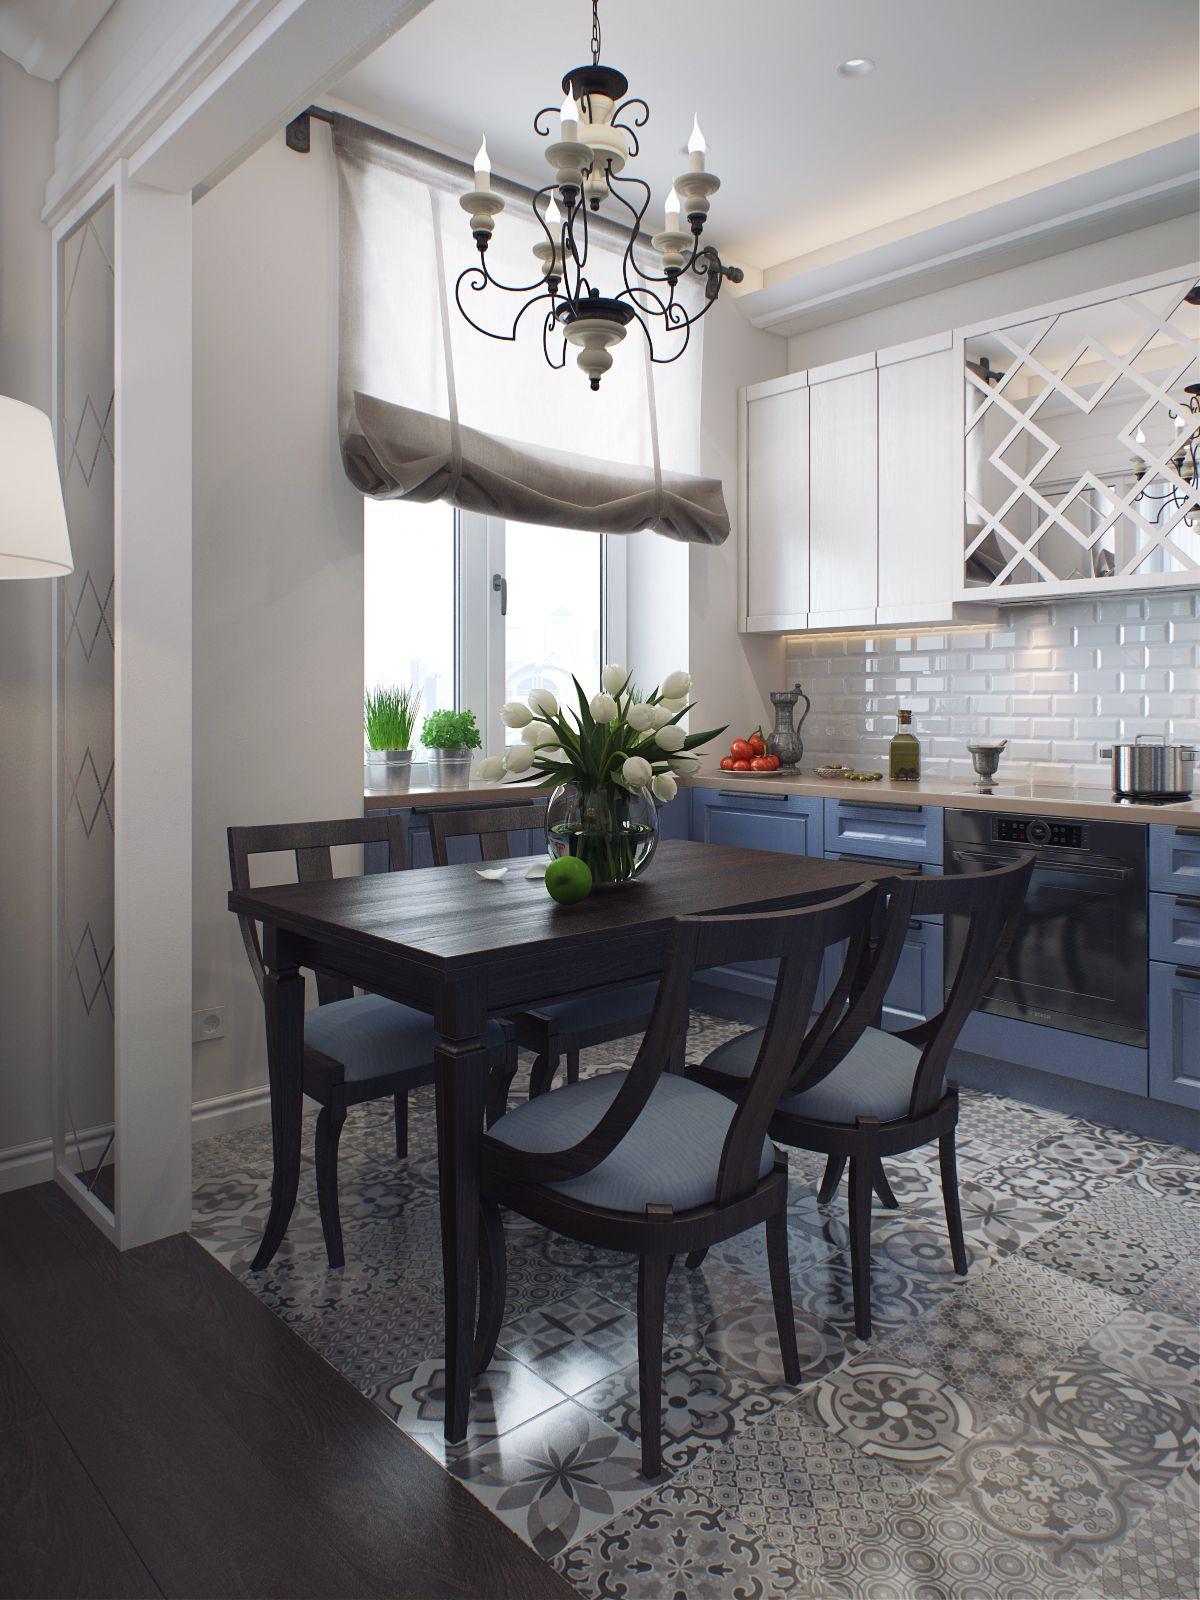 Küchenideen farben mellow interior u Столовая в стиле современная классика